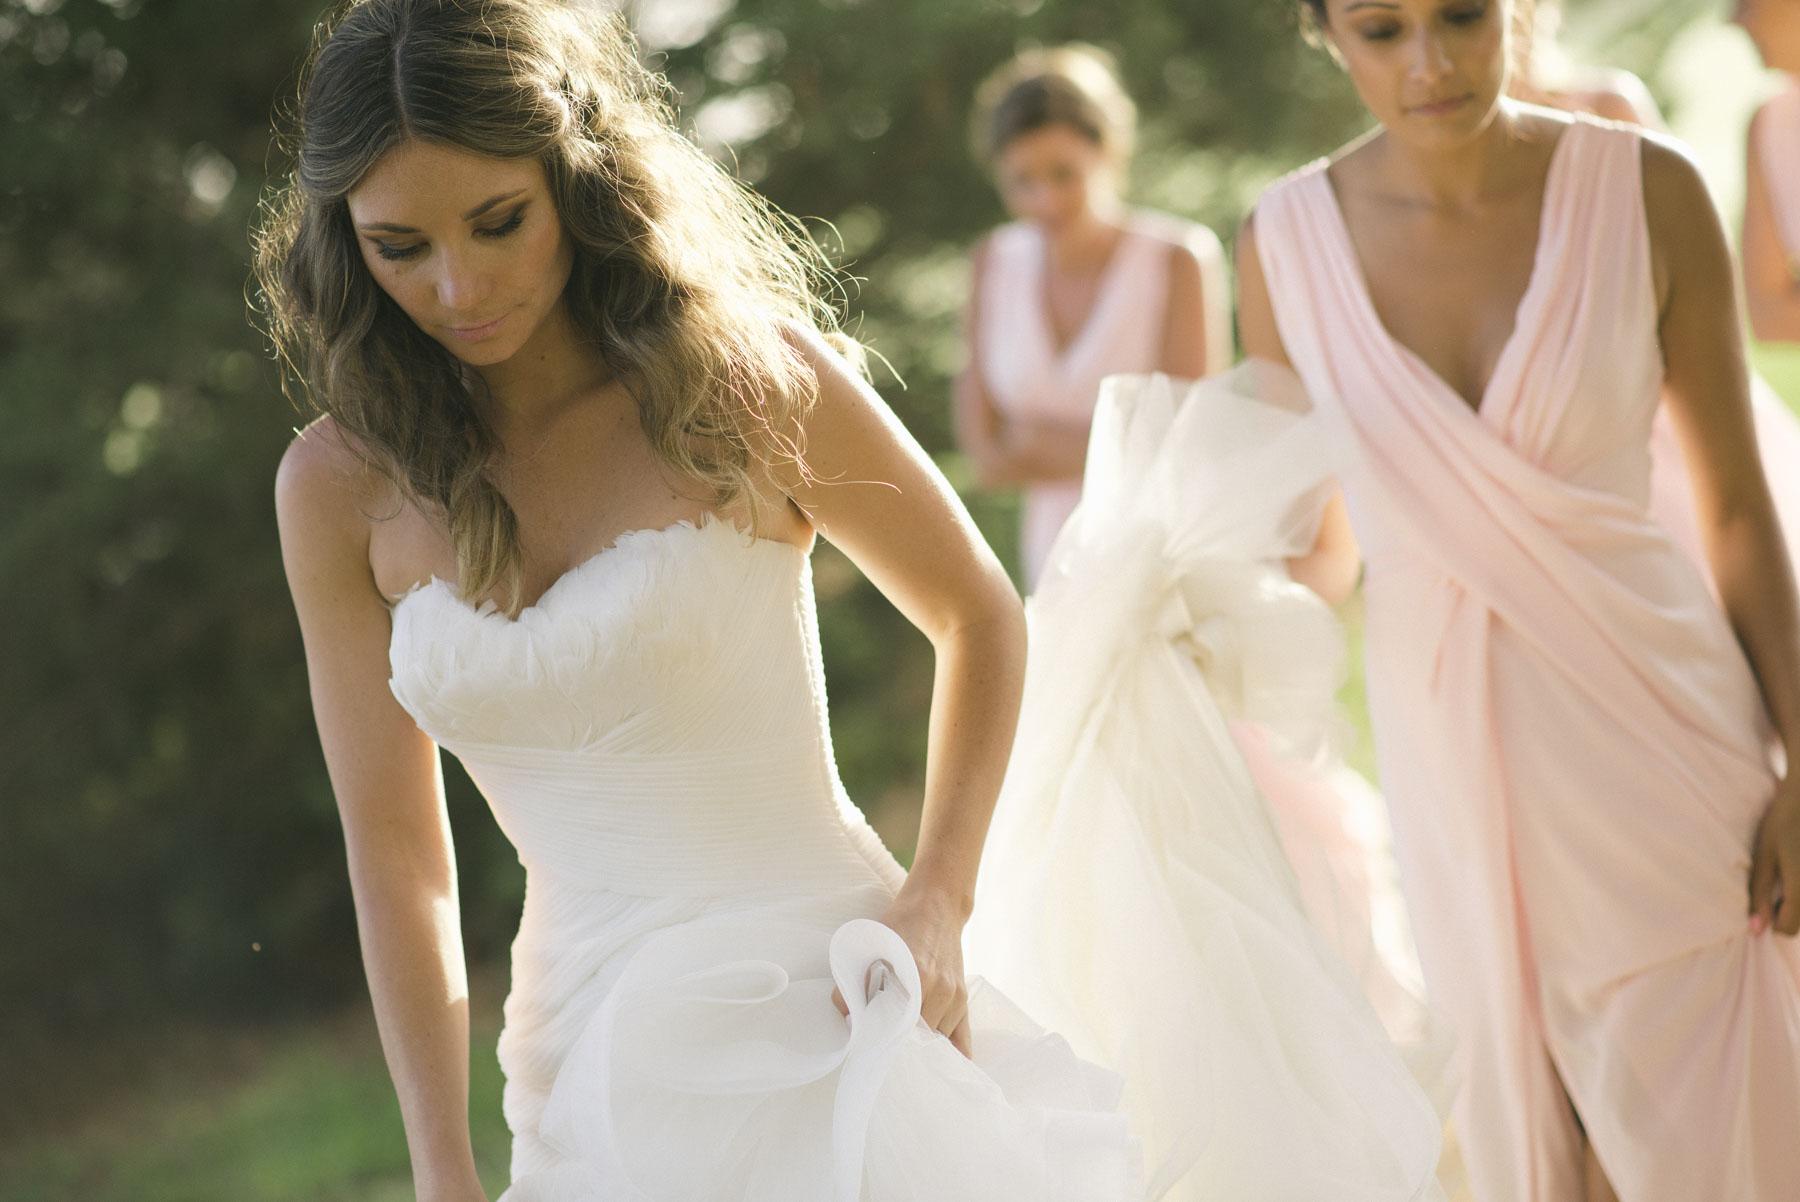 1501vand-329alan_moyle_wedding_portrait_brighton_bayside_werribee_estate_mansion_zoo_rustic_styled_garden_mansion_candid_documentry_victoria_whitelaw.jpg